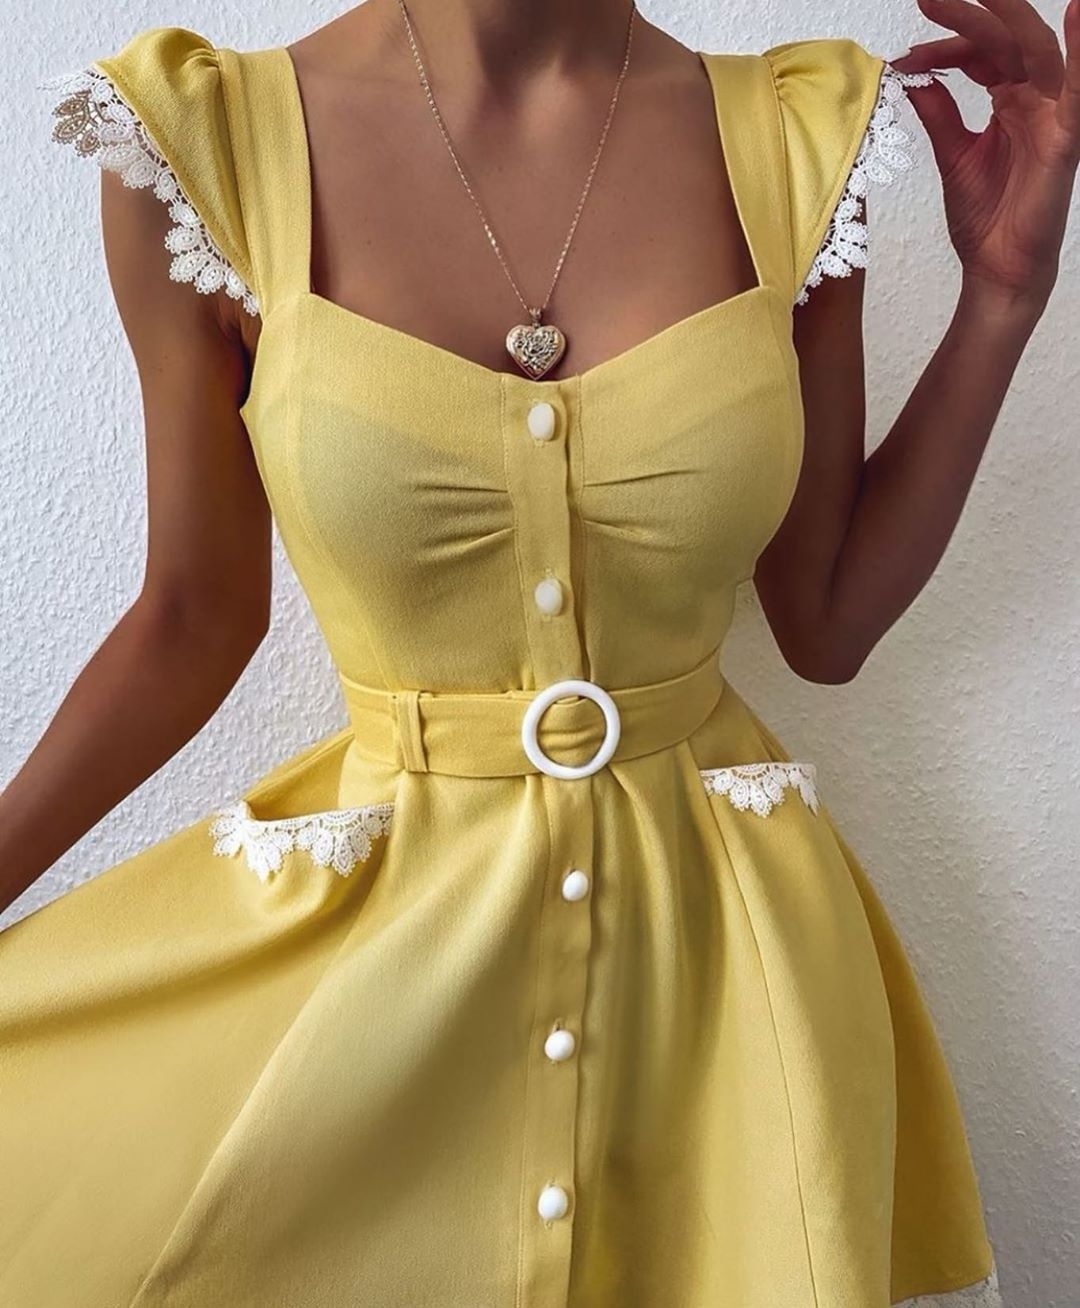 الغربية On Instagram كيوت تبي فساتين للعيد واسعارهم حلوه ادخلو بوتيك رزان فاشن Razan Fashion90 Razan Vintage Party Dresses Fashion Midi Dress